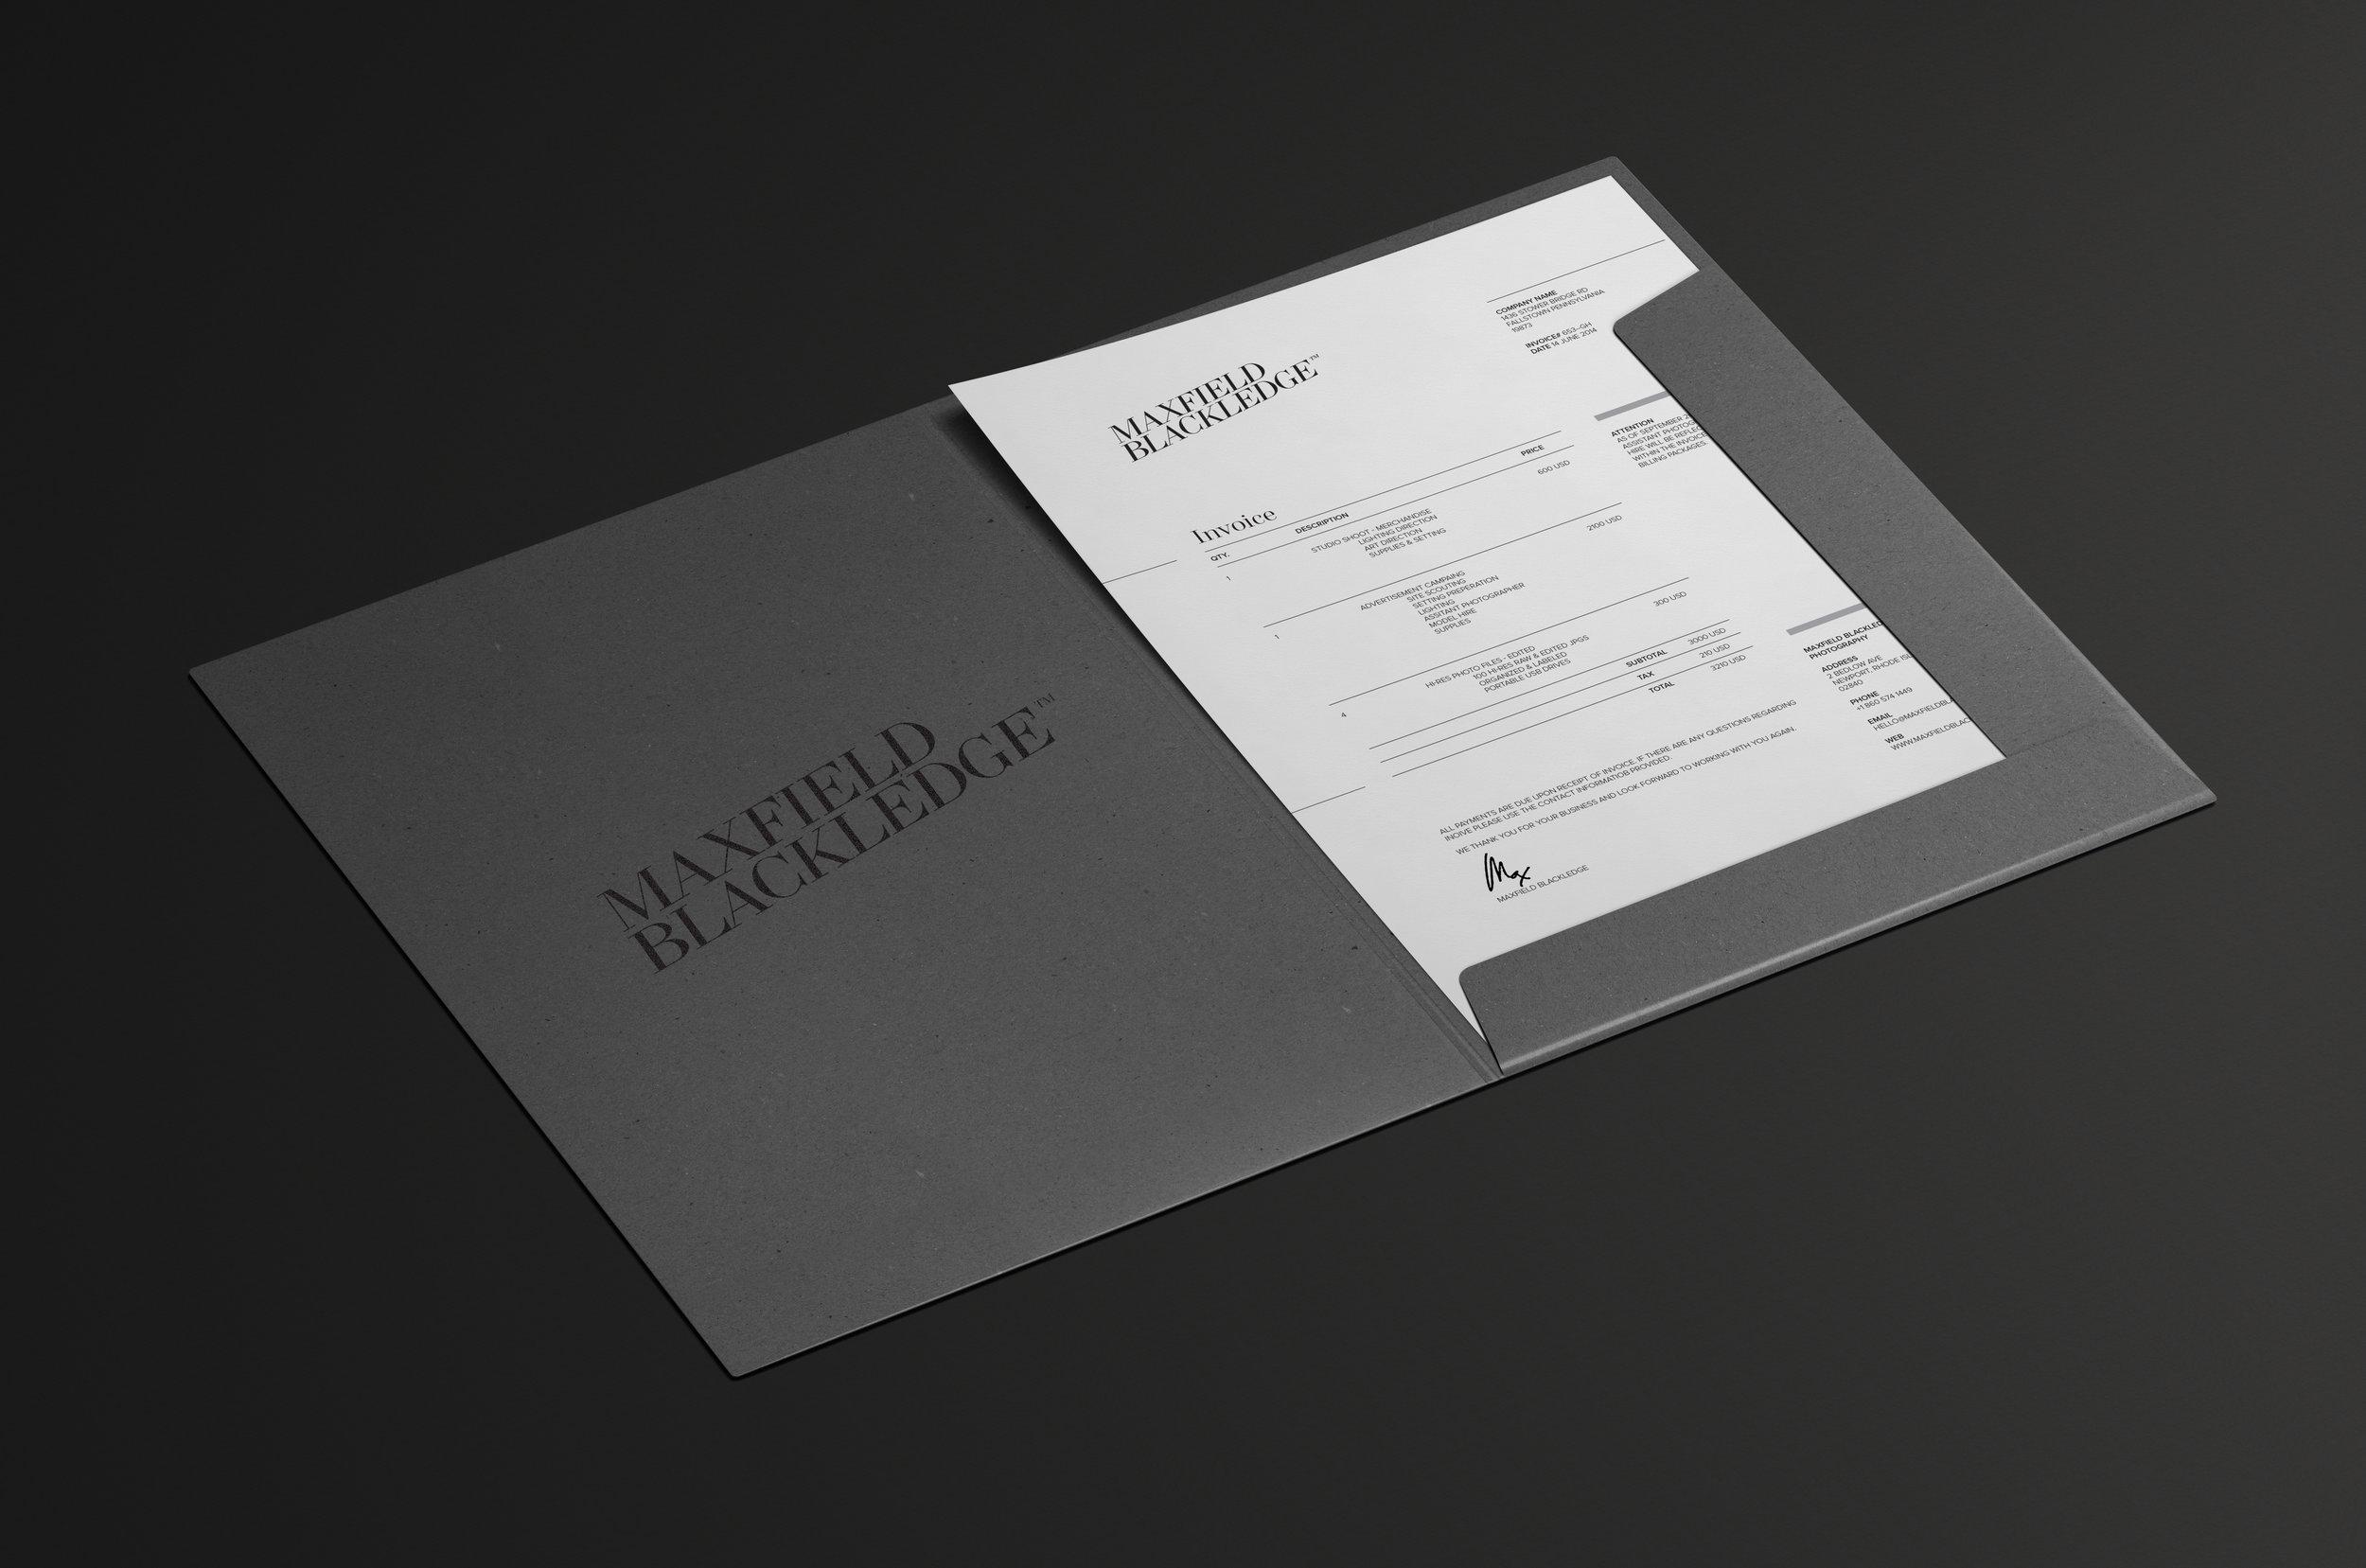 maxfield blackledge_folder and letterhead.jpg